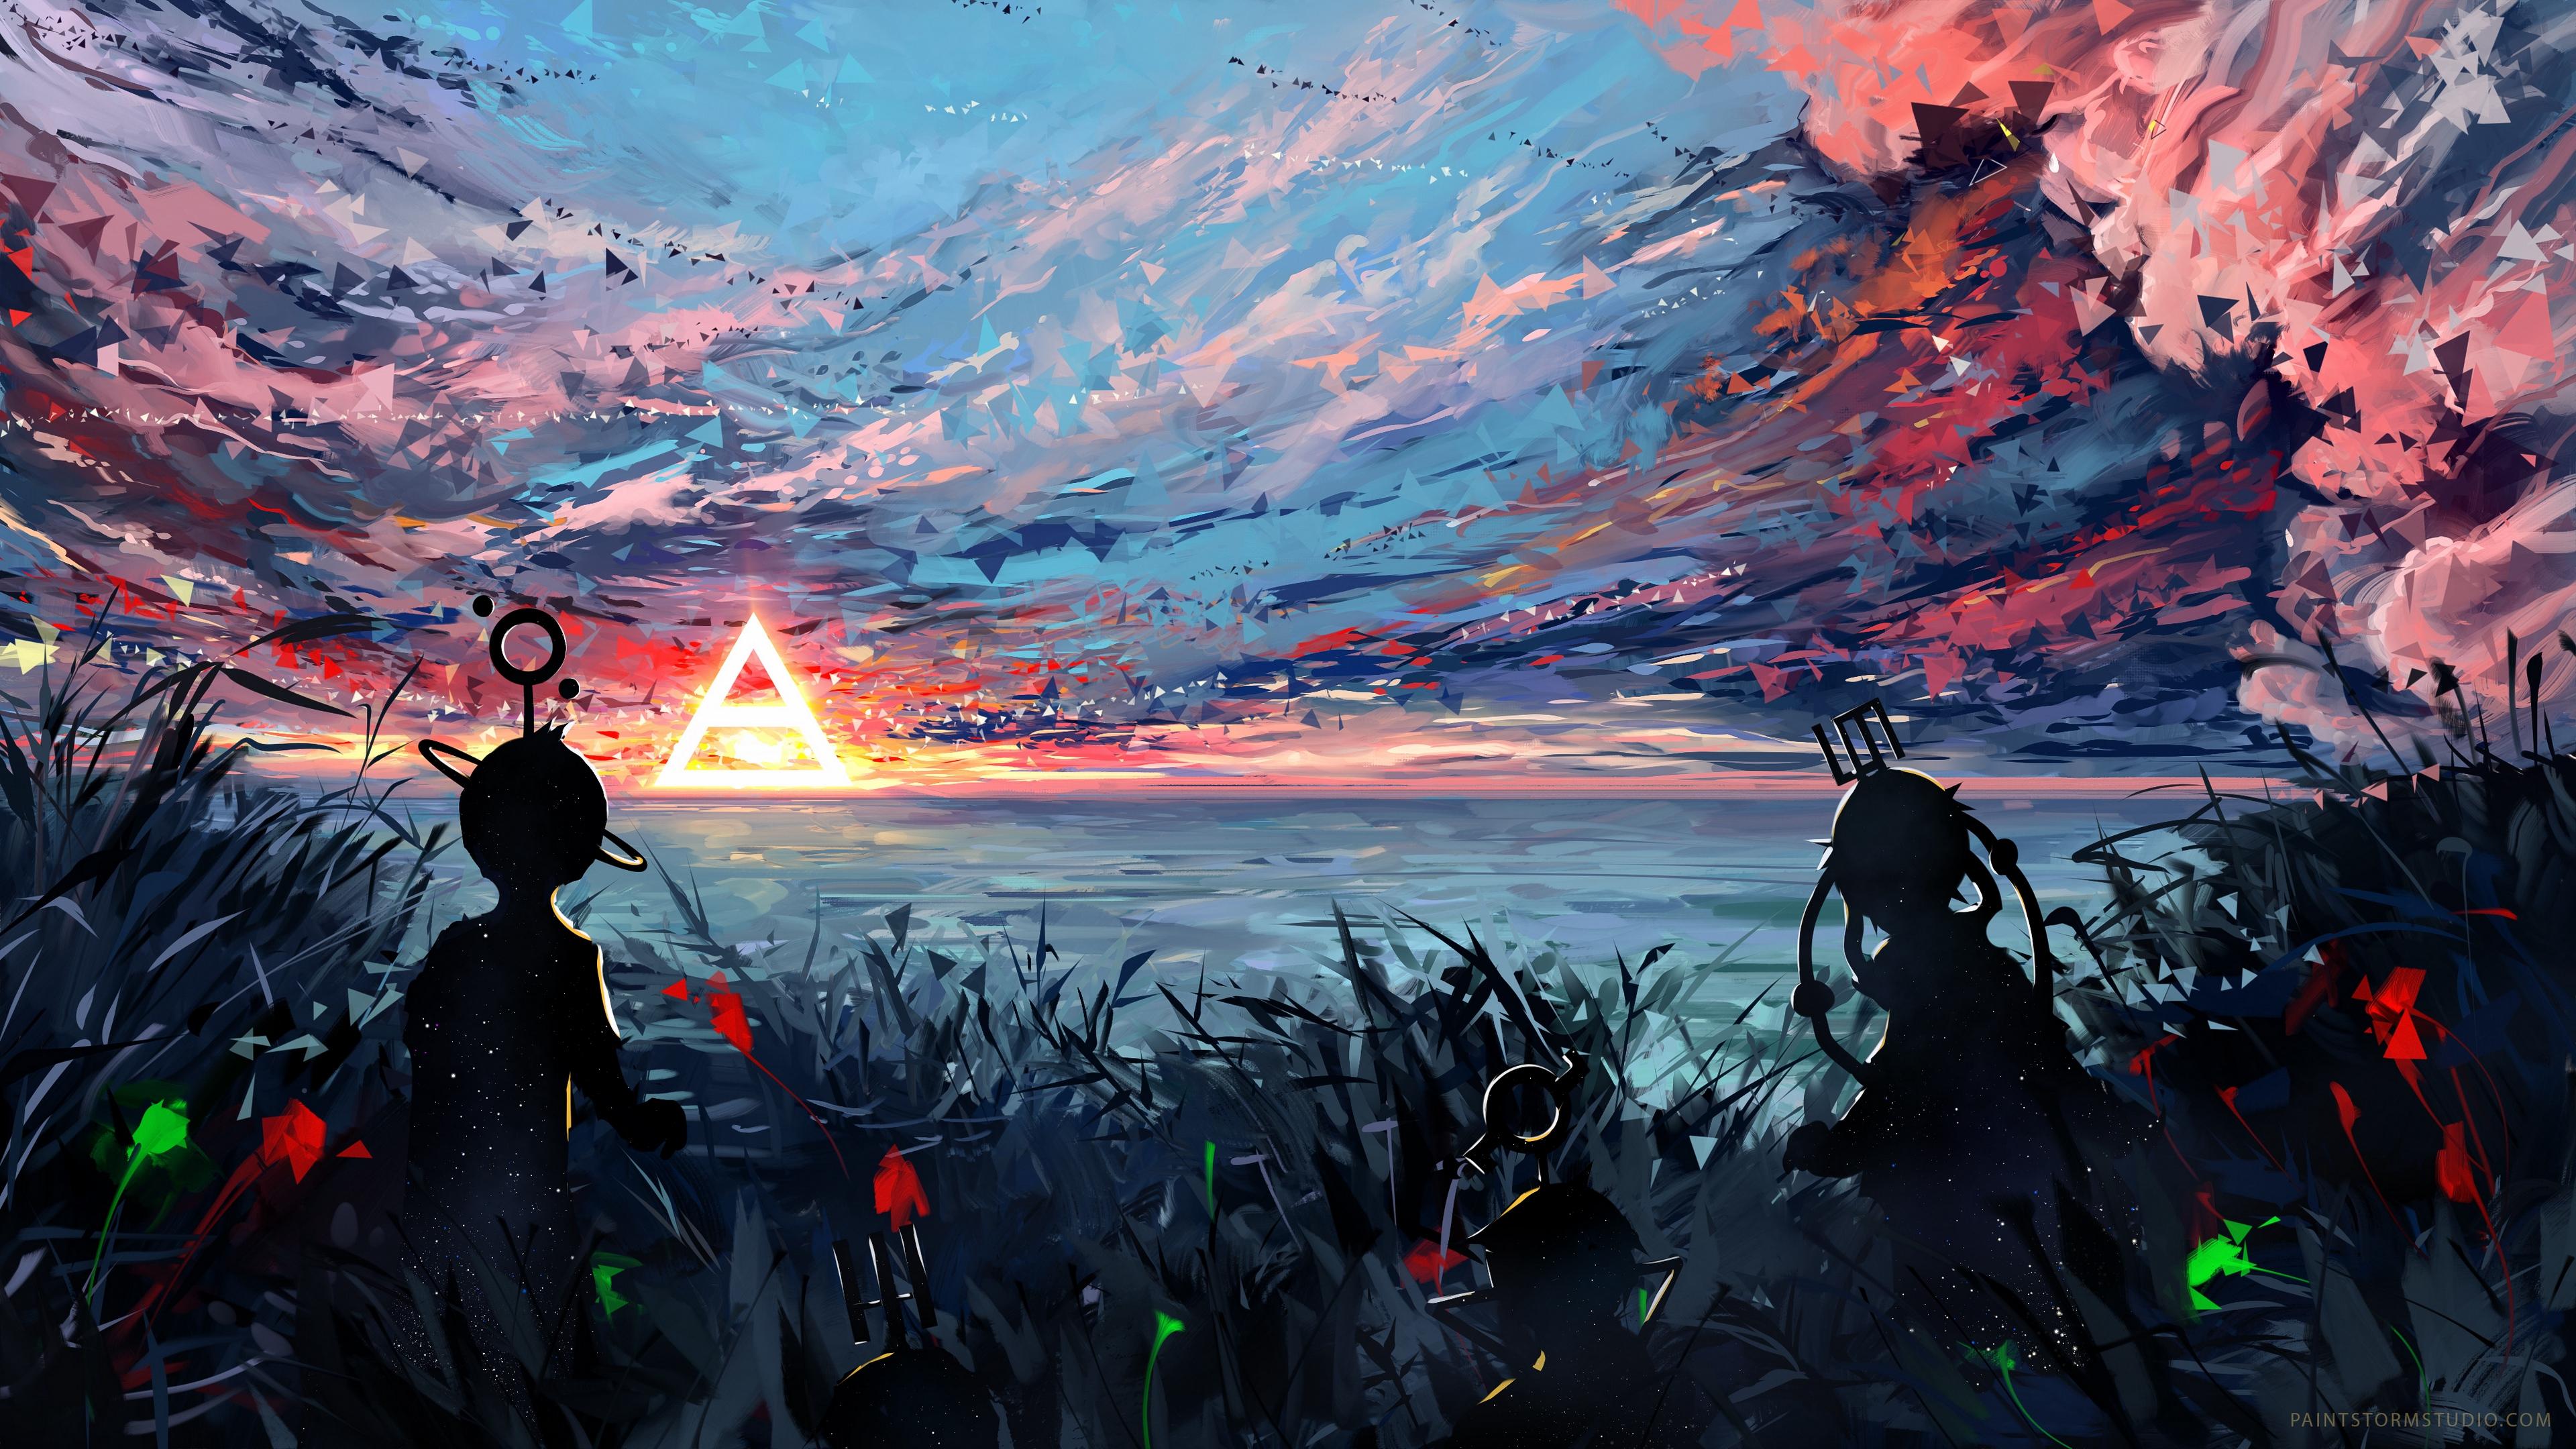 silhouette art sky spots colorful 4k 1543945731 - silhouette, art, sky, spots, colorful 4k - Sky, Silhouette, art